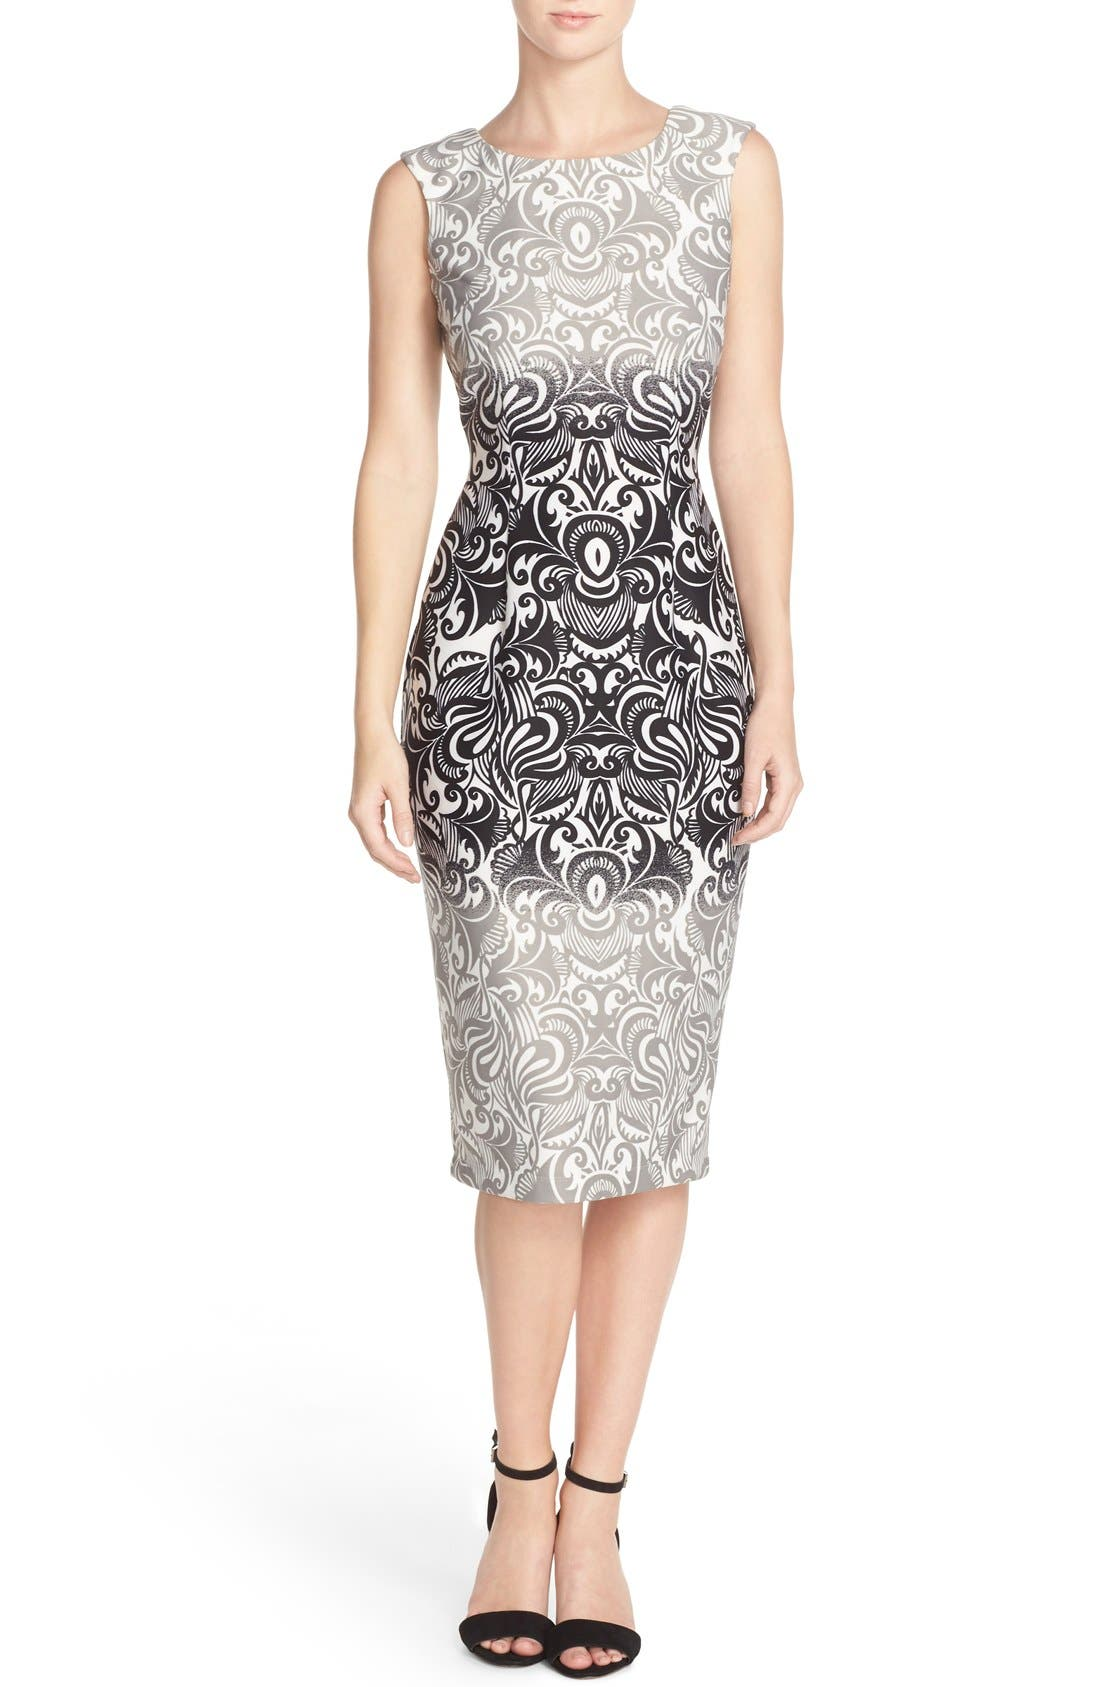 Alternate Image 1 Selected - Gabby Skye Print Scuba Sheath Dress